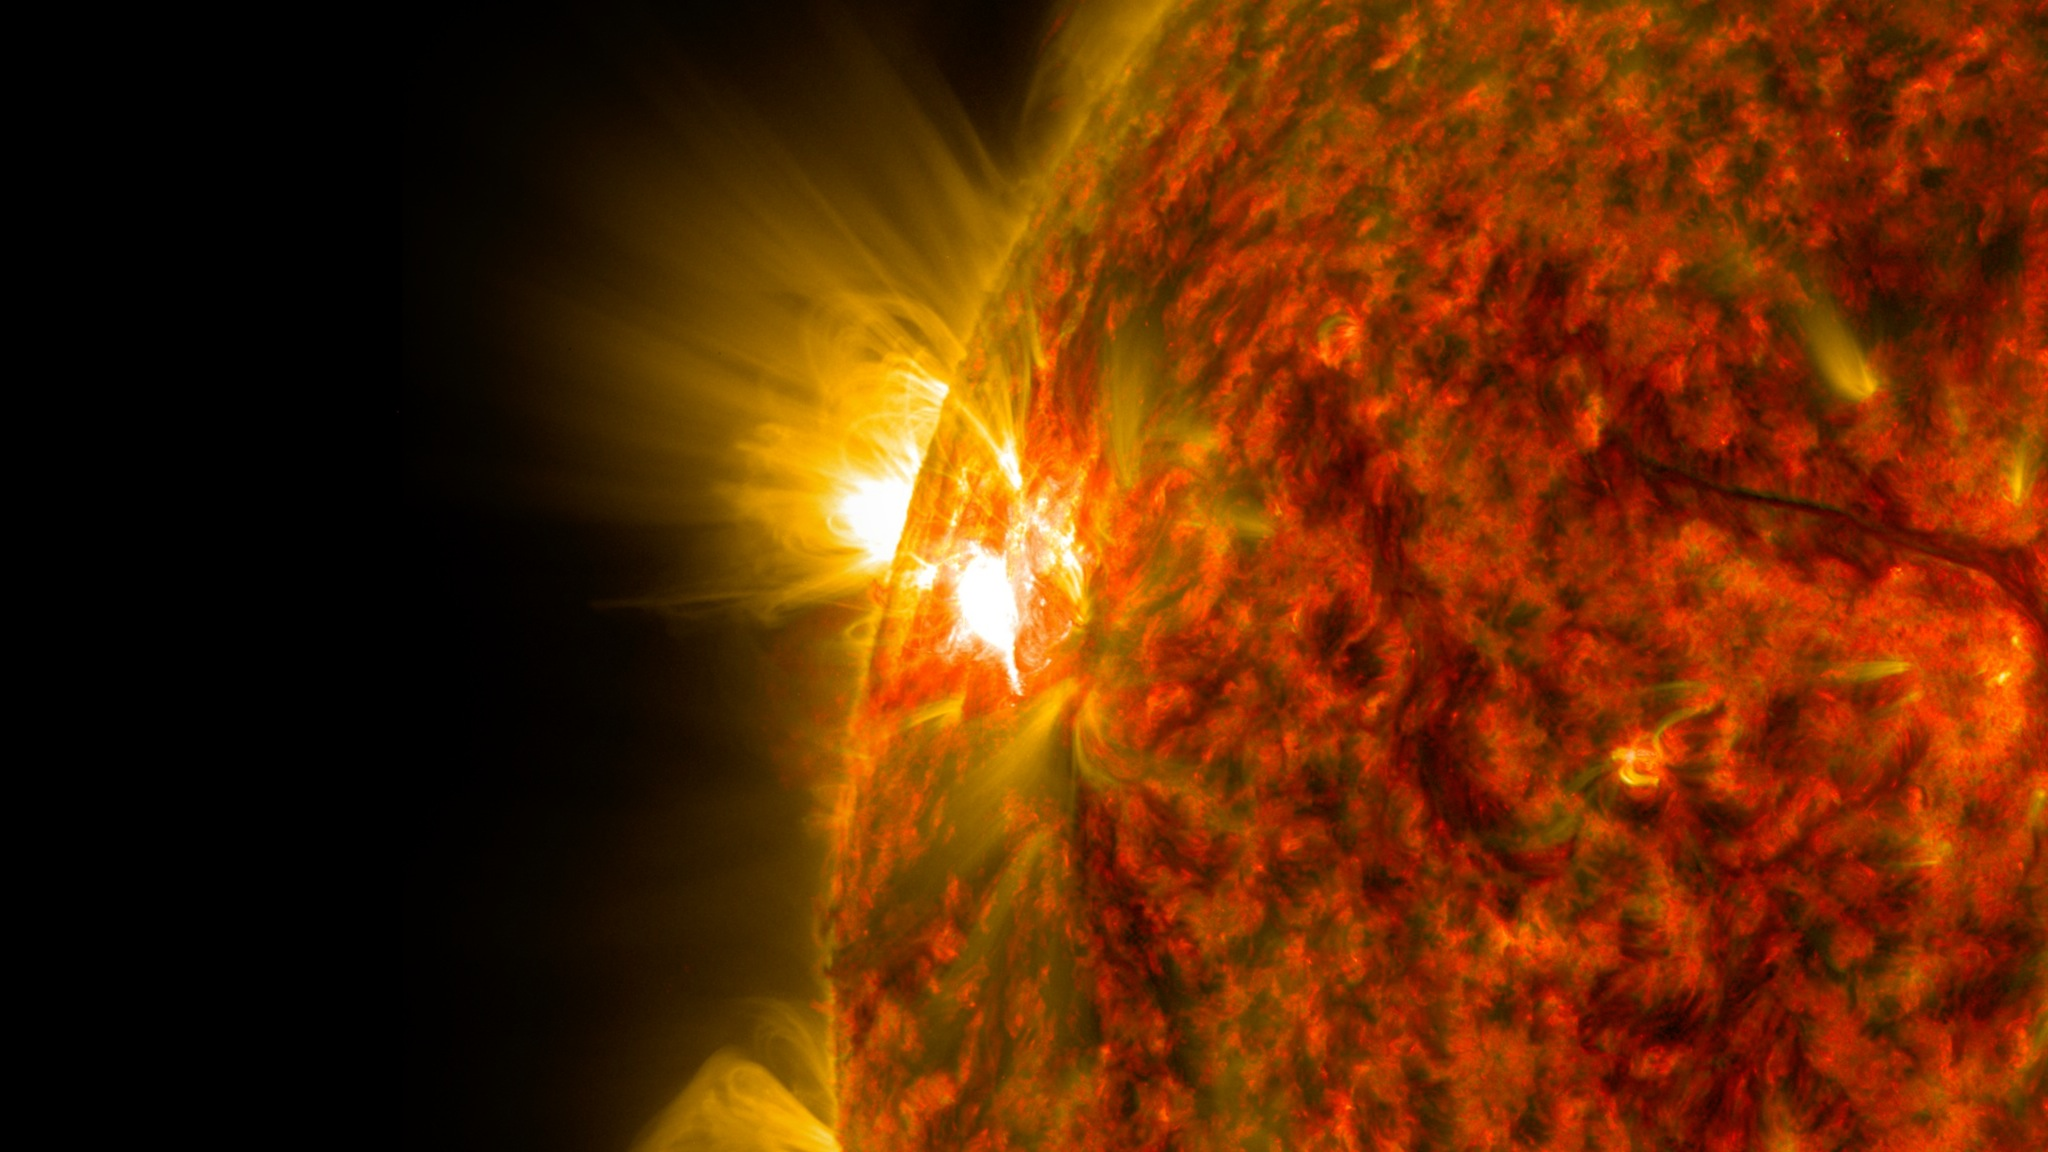 M7.9クラスの中規模太陽フレアが発生!NASA画像公開